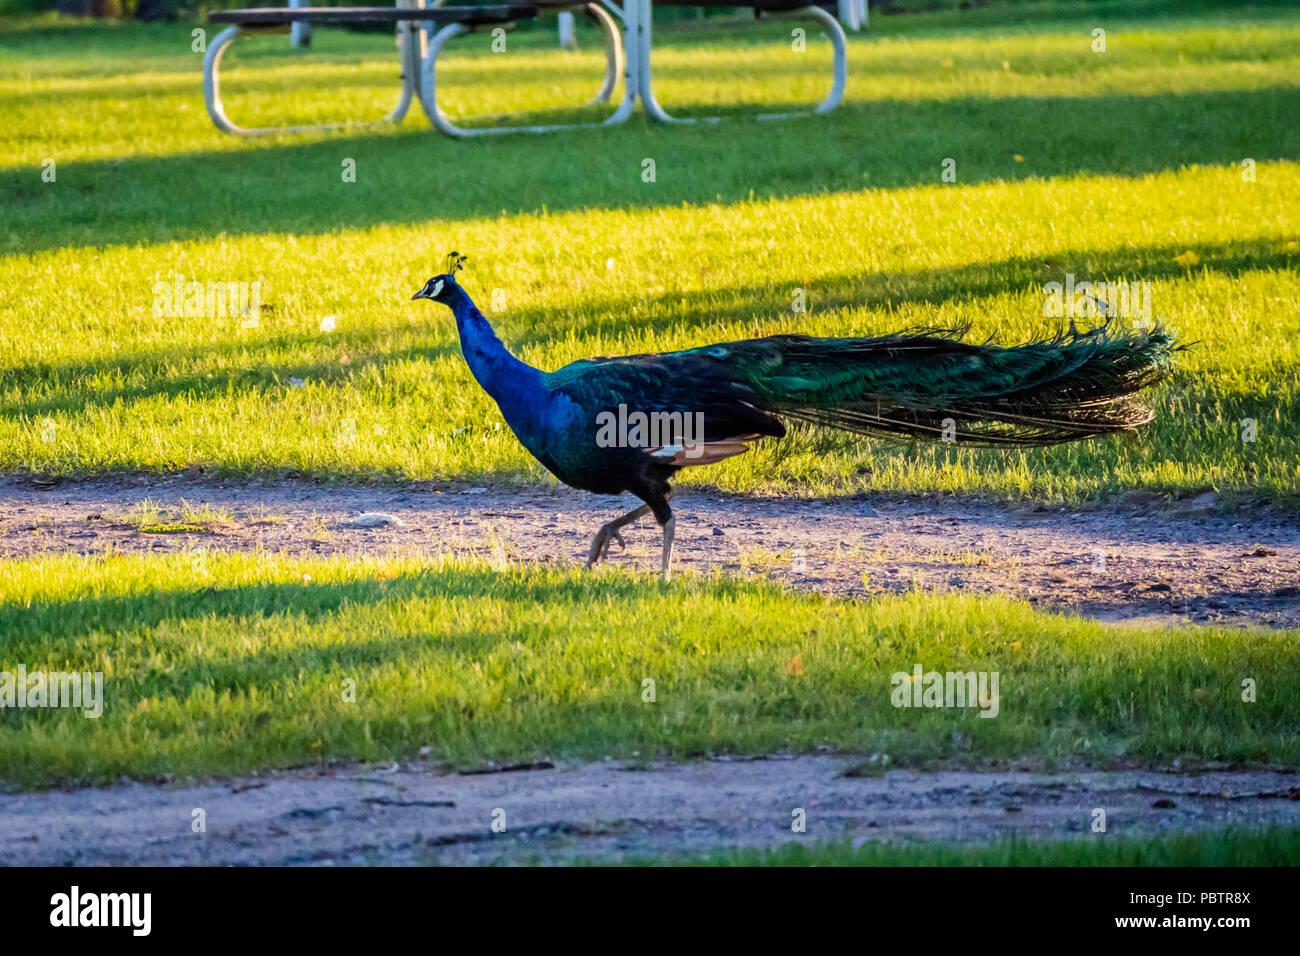 A Peafowl Peacock in Ham Lake, Minnesota - Stock Image